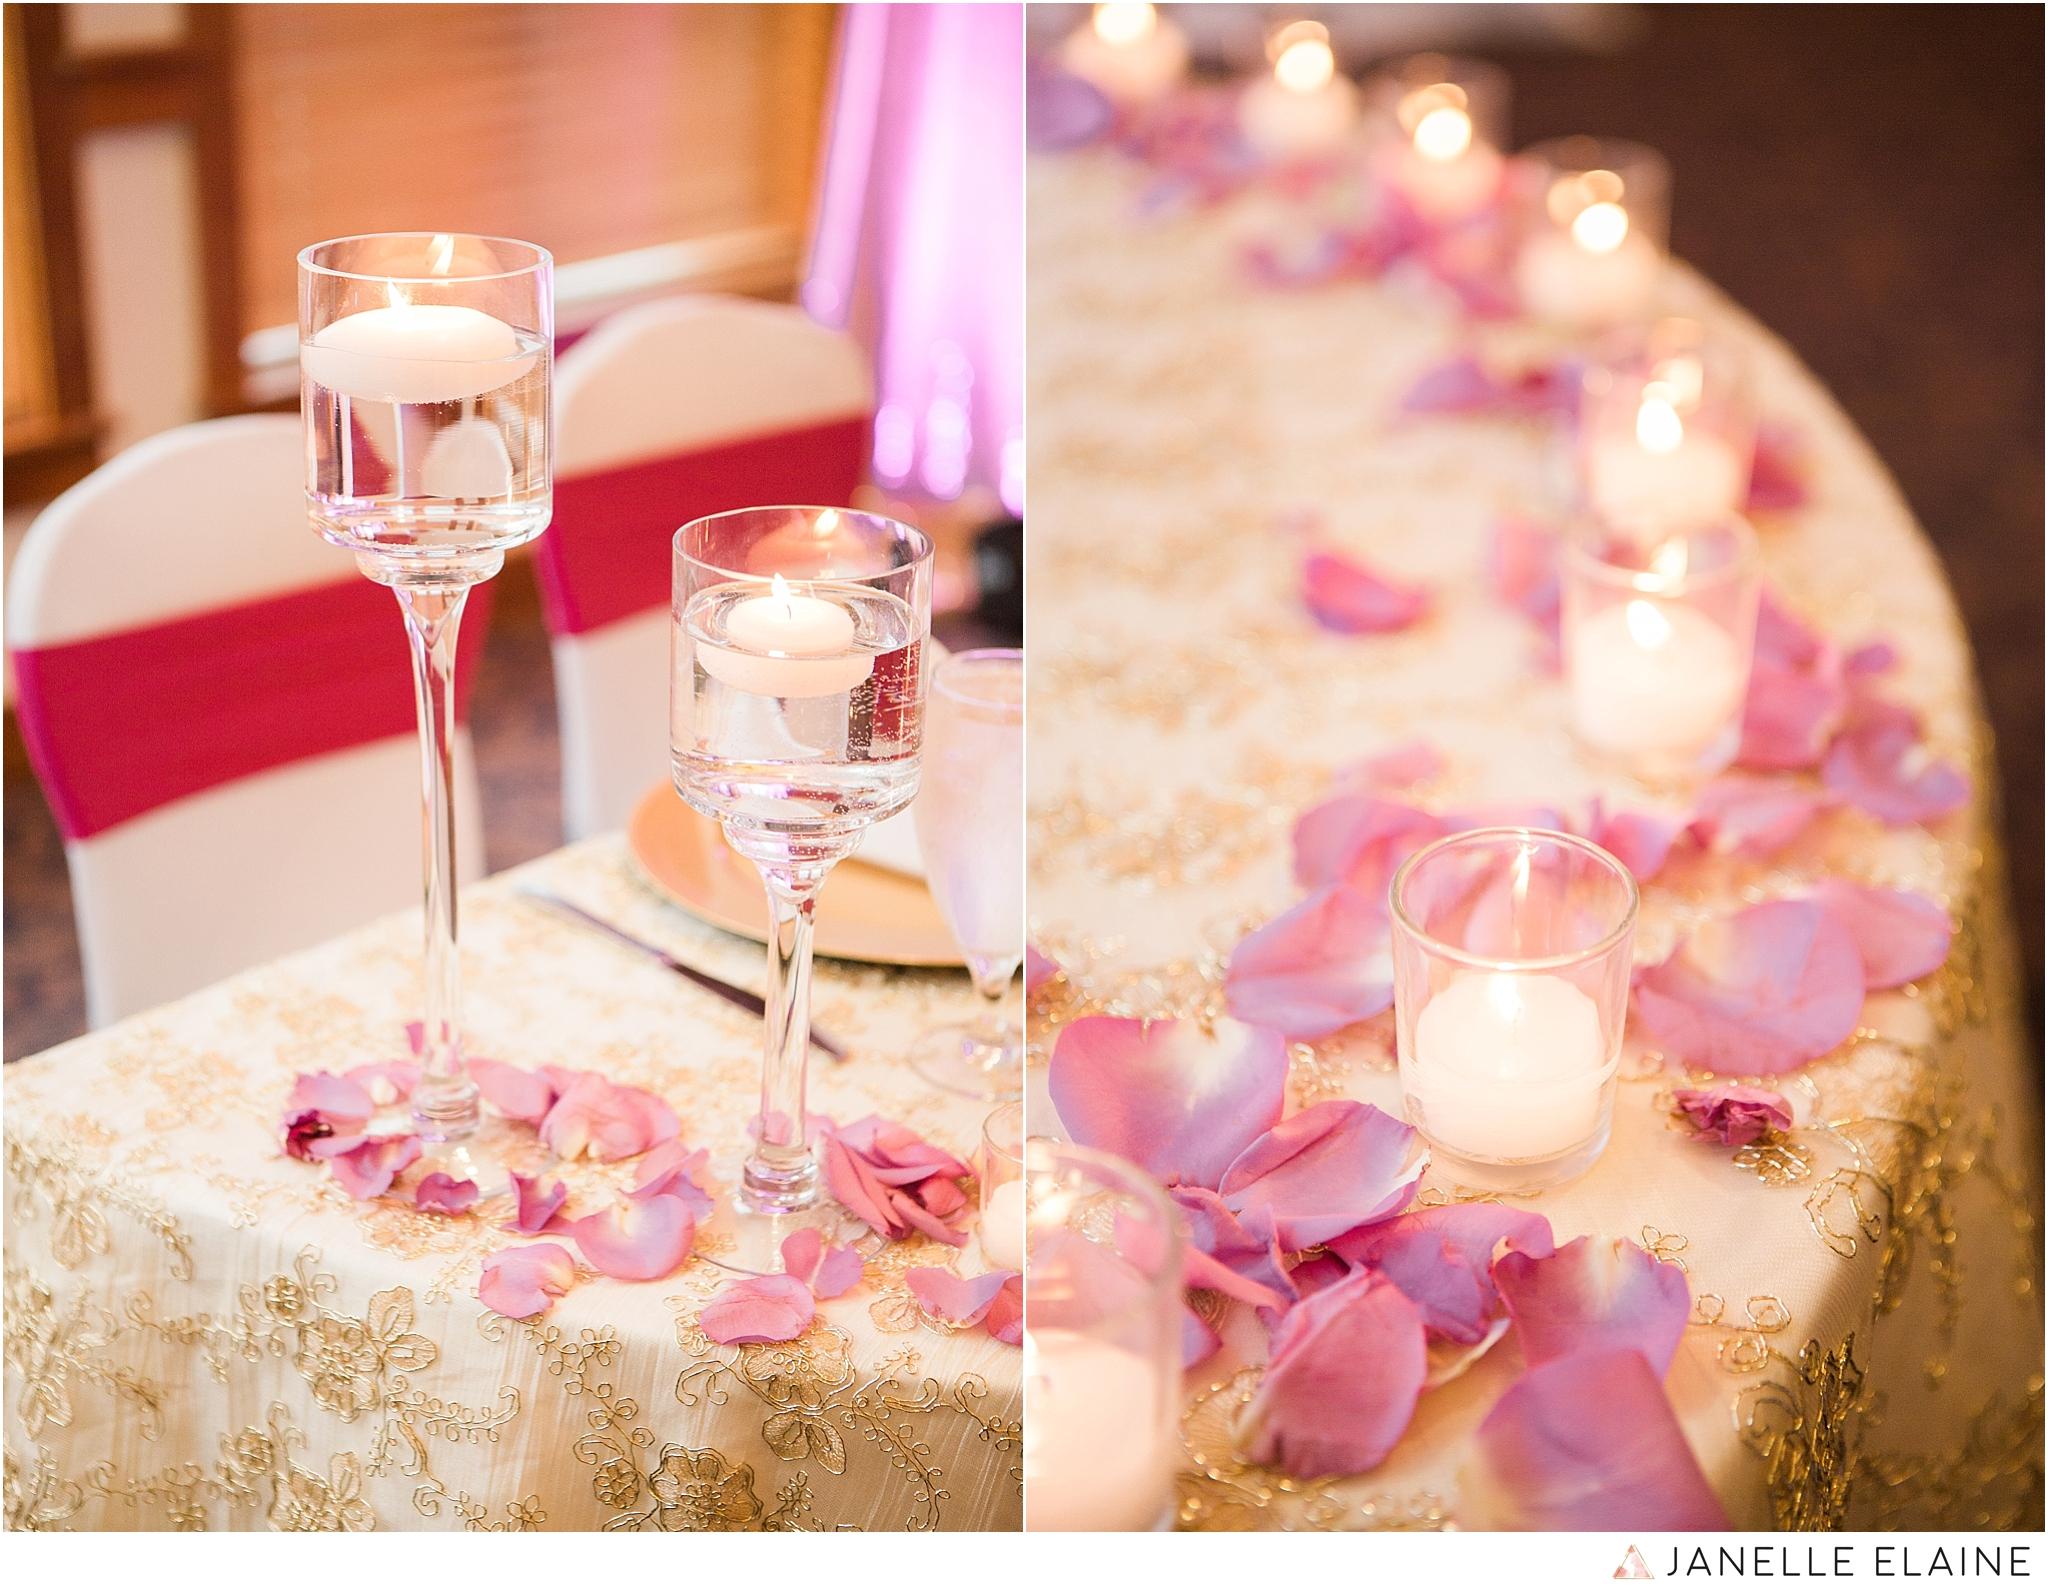 janelle elaine photography-the club at snoqualmie ridge-washington-wedding-photography-reception-56.jpg